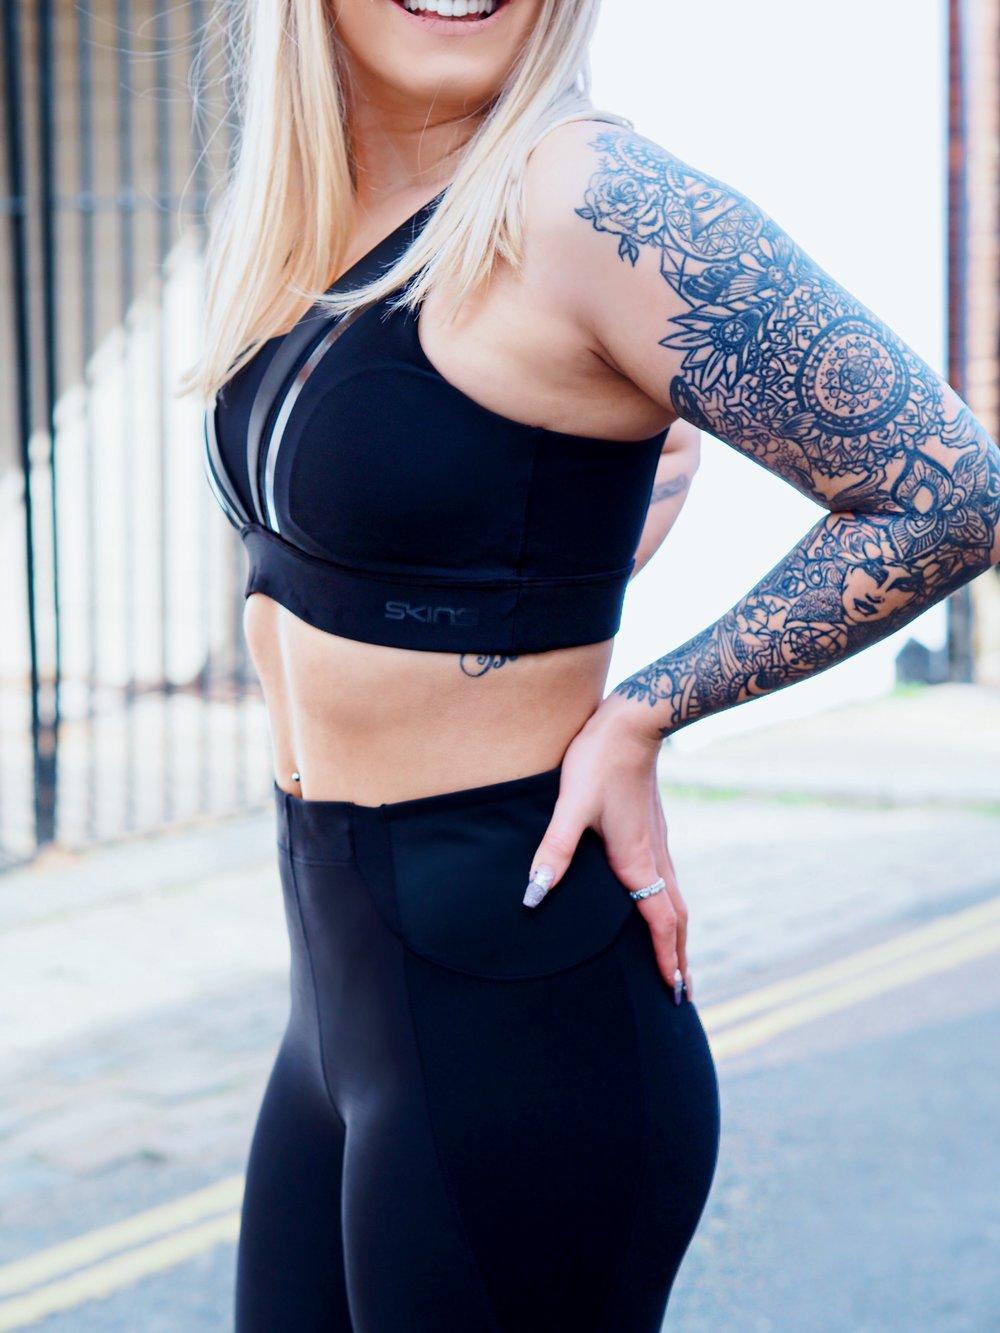 SKINS Sportswear Brighton Fitness Blogger